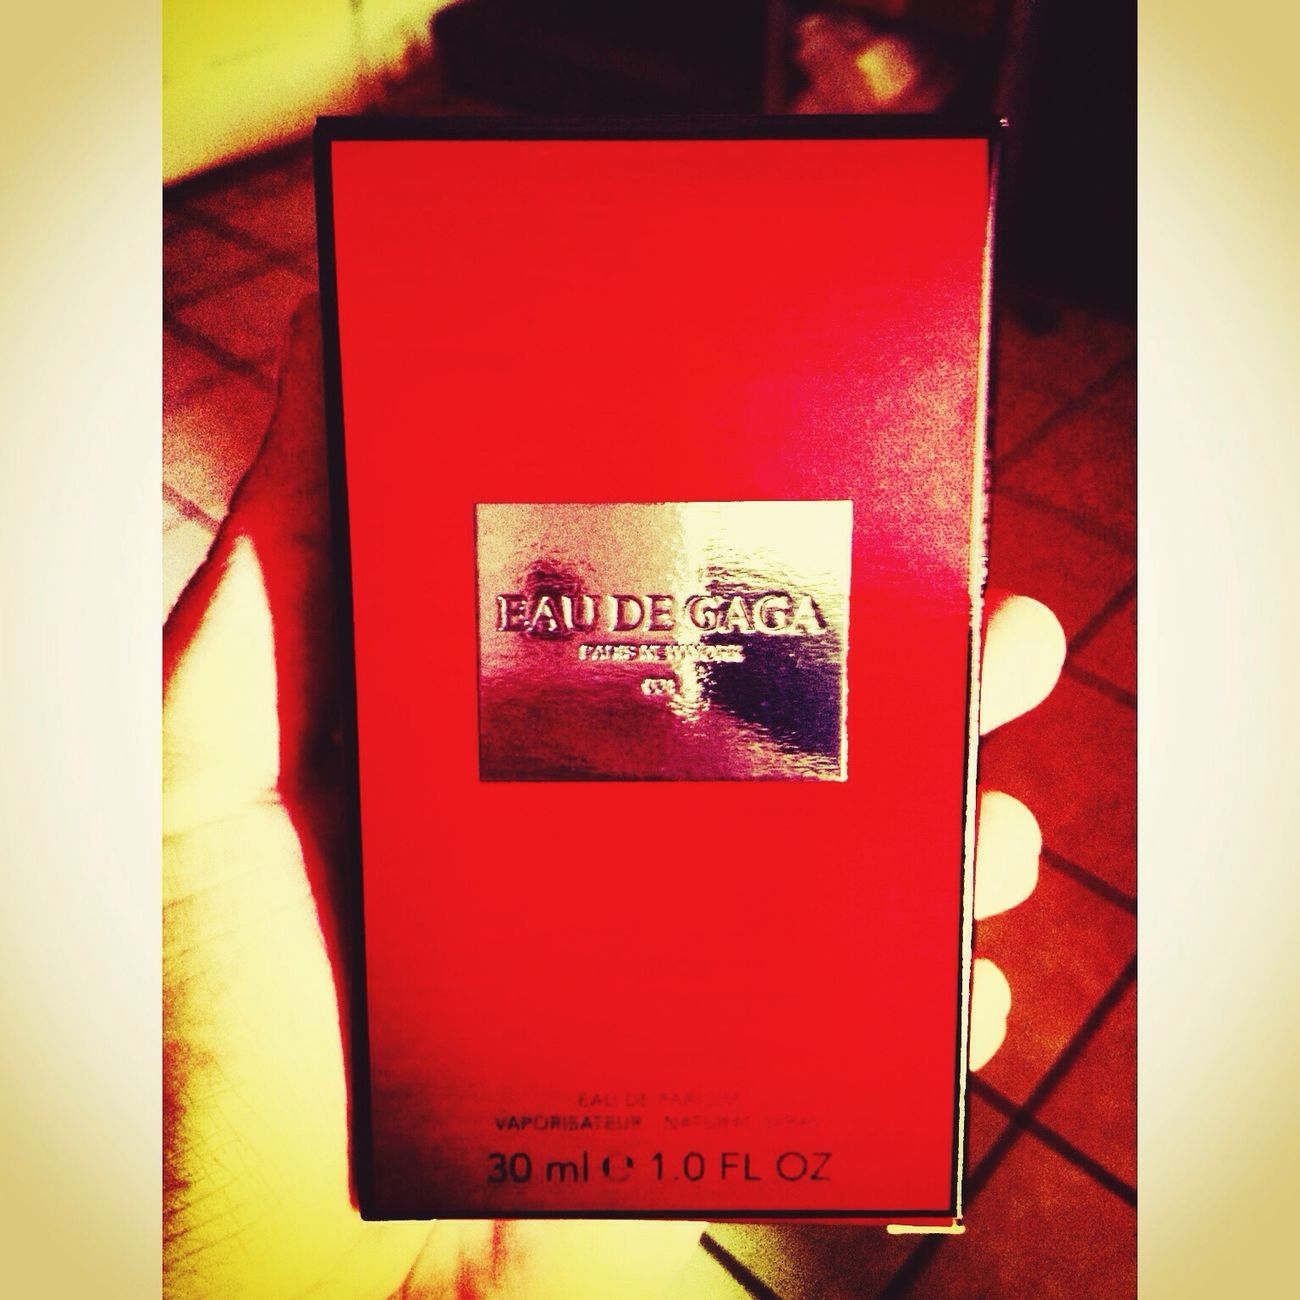 EAU DE GAGA - Lady Gaga second fragrance. Littlemonster ArtPop Unisex MonstersForLife